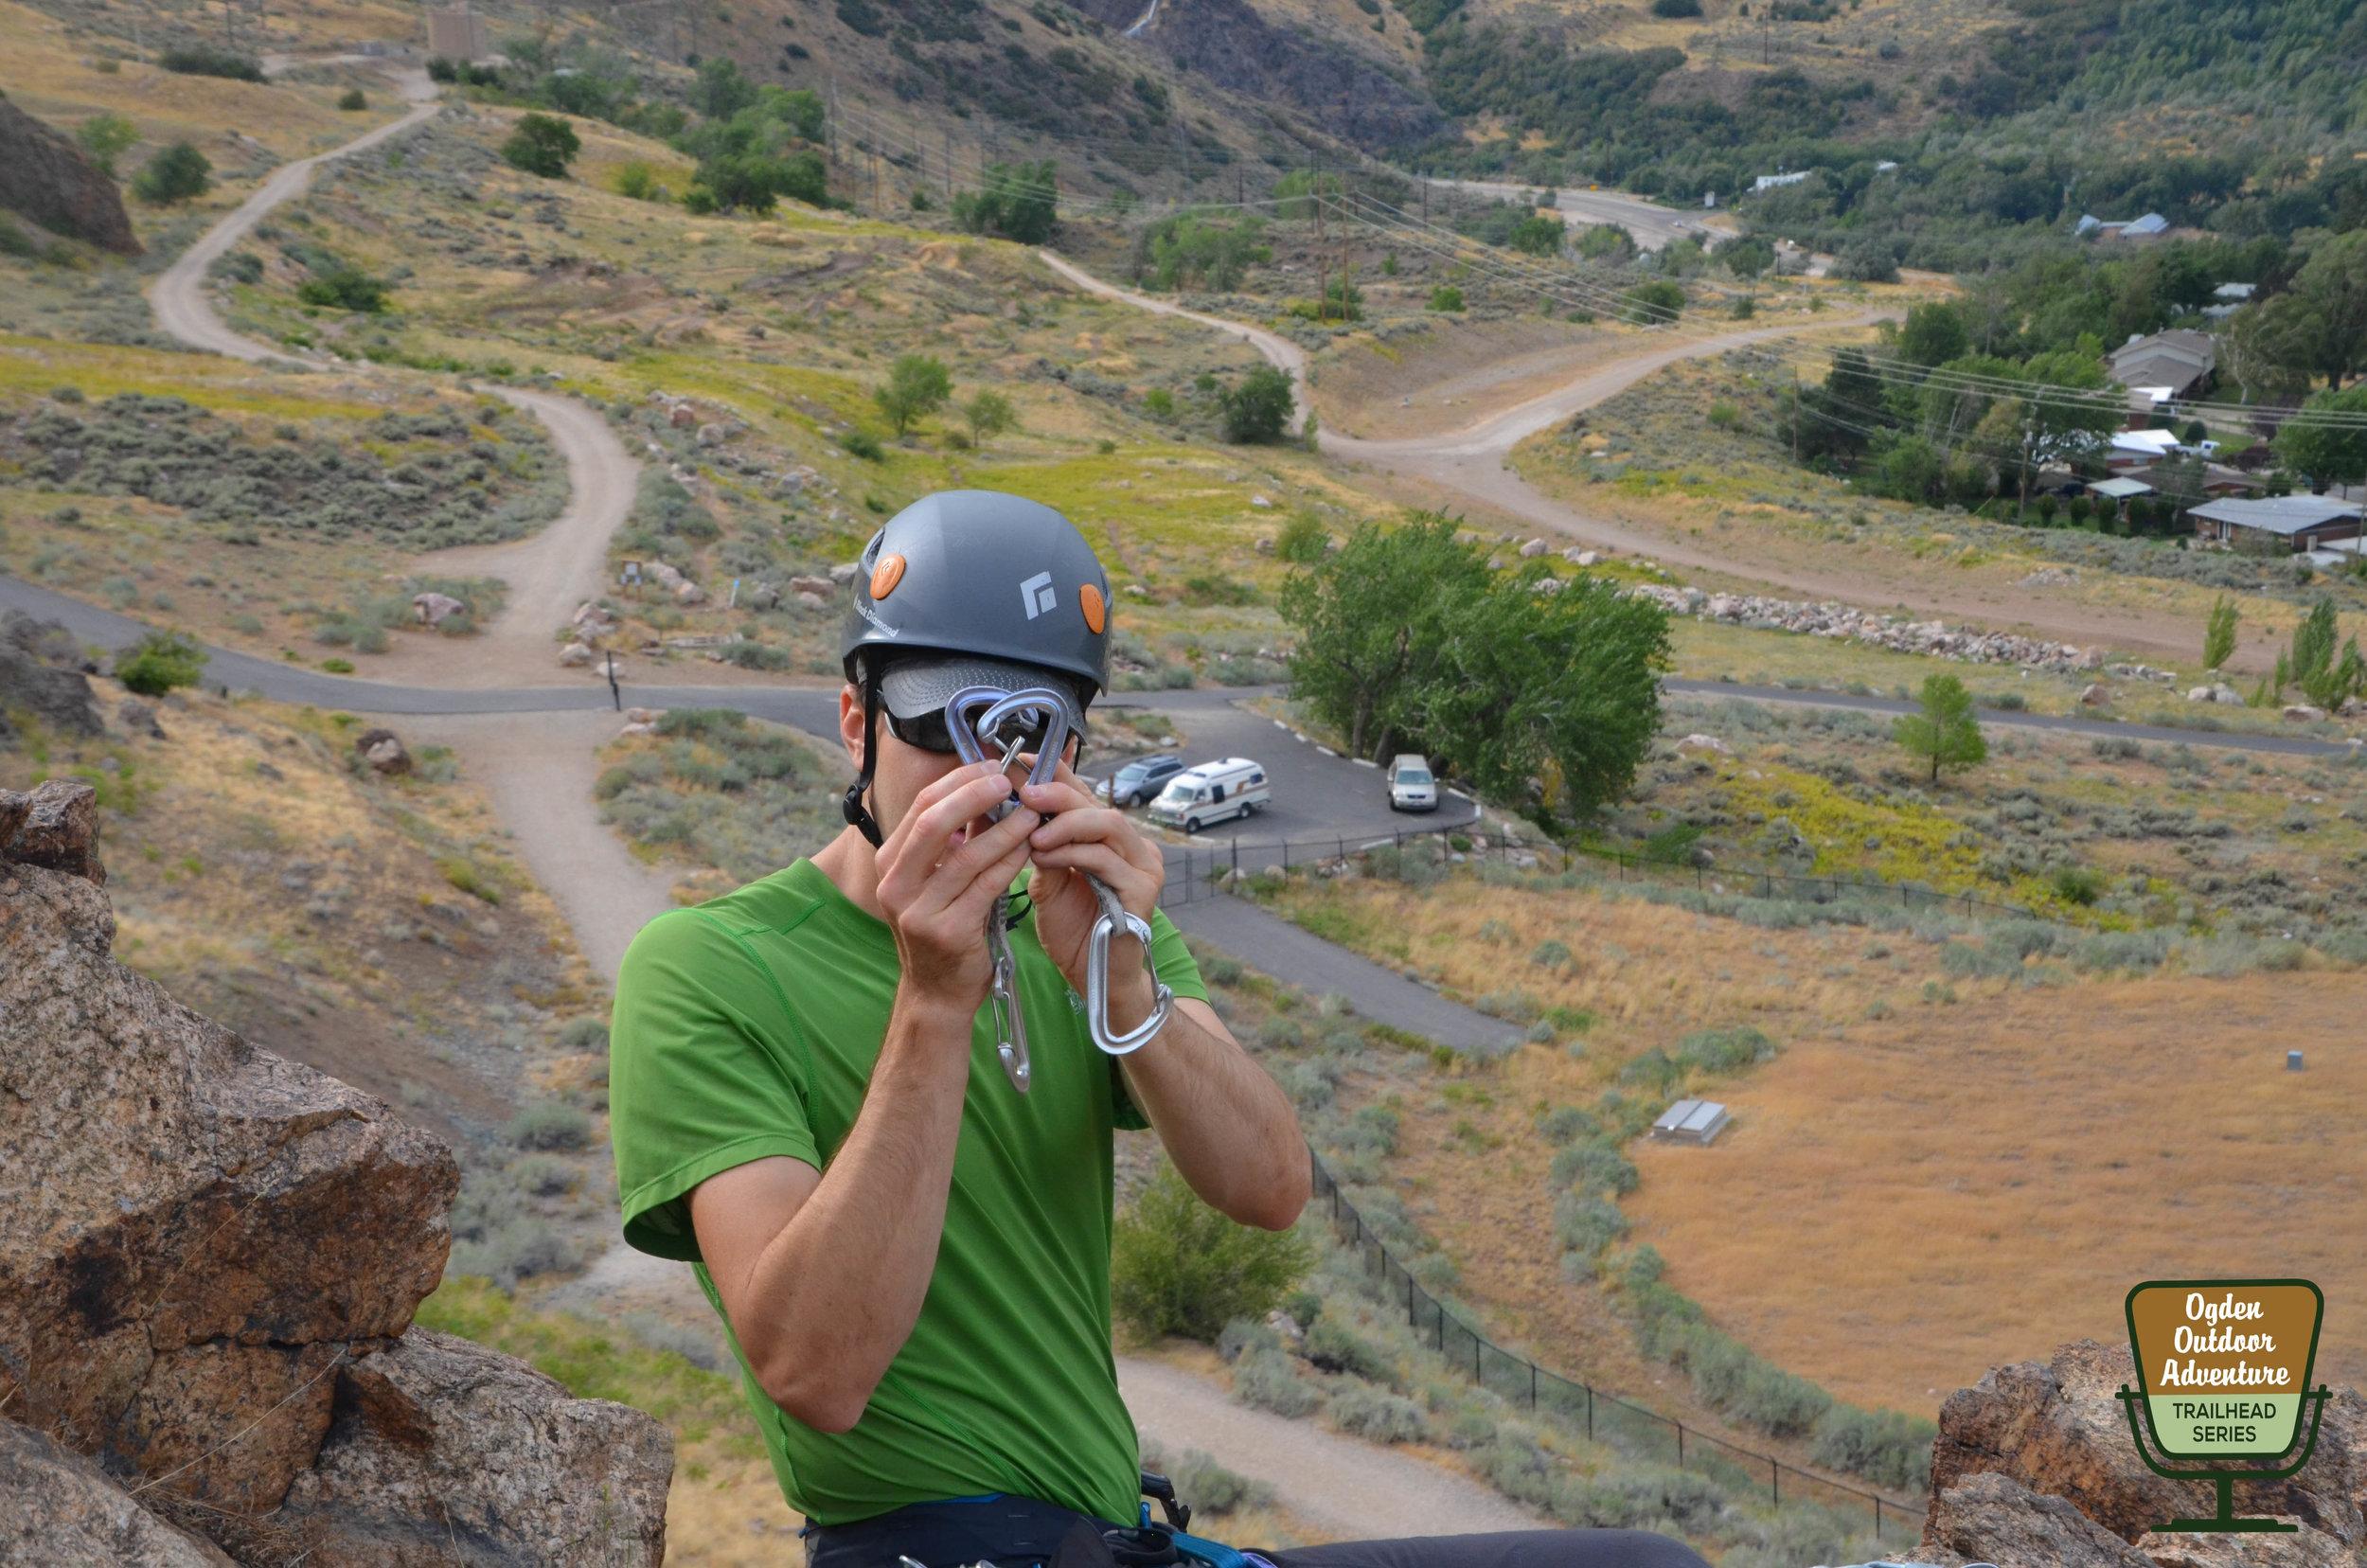 Ogden Outdoor Adventure Show 248 - Bear House Mountaineering-4.jpg